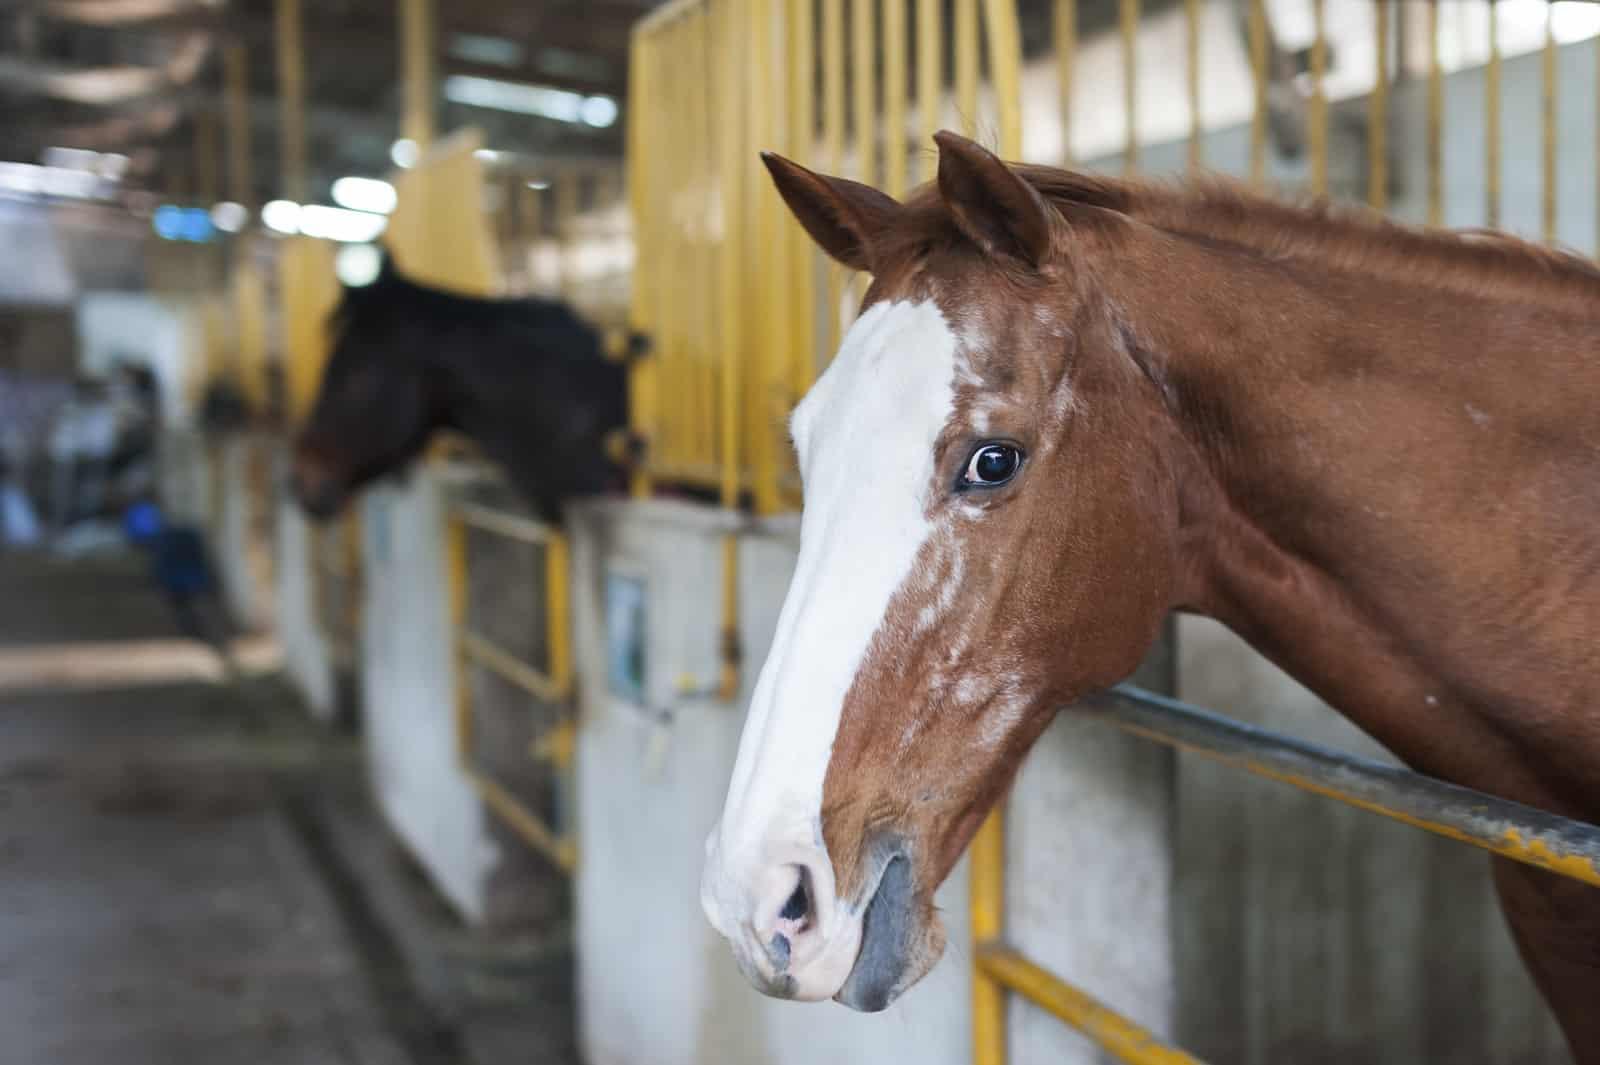 Senior horses